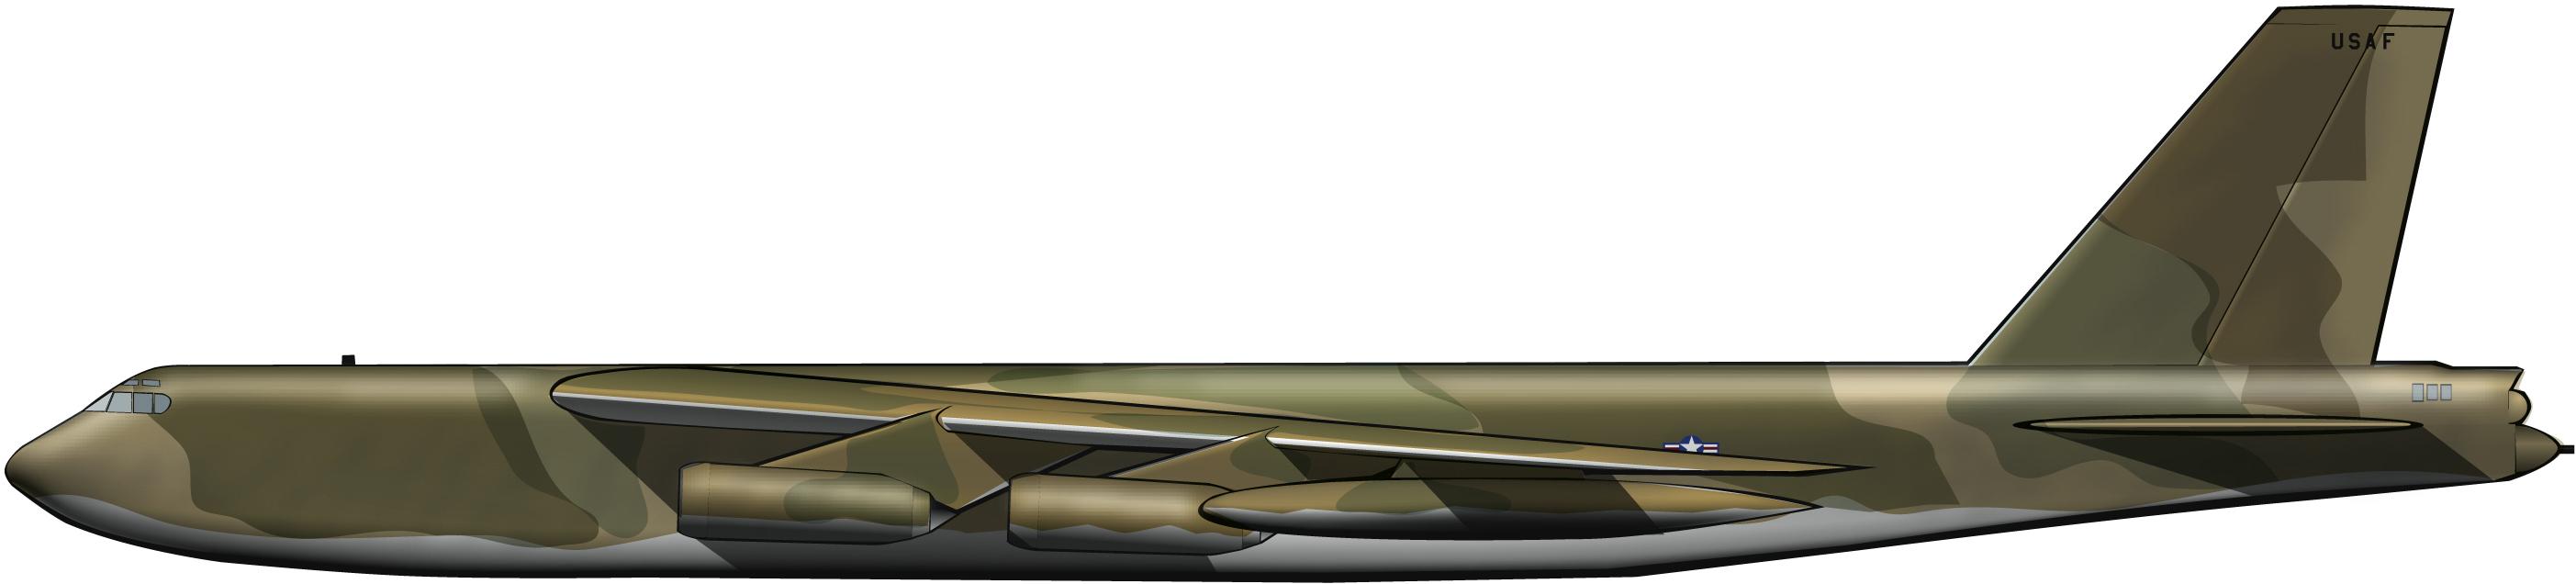 b52niagara1968